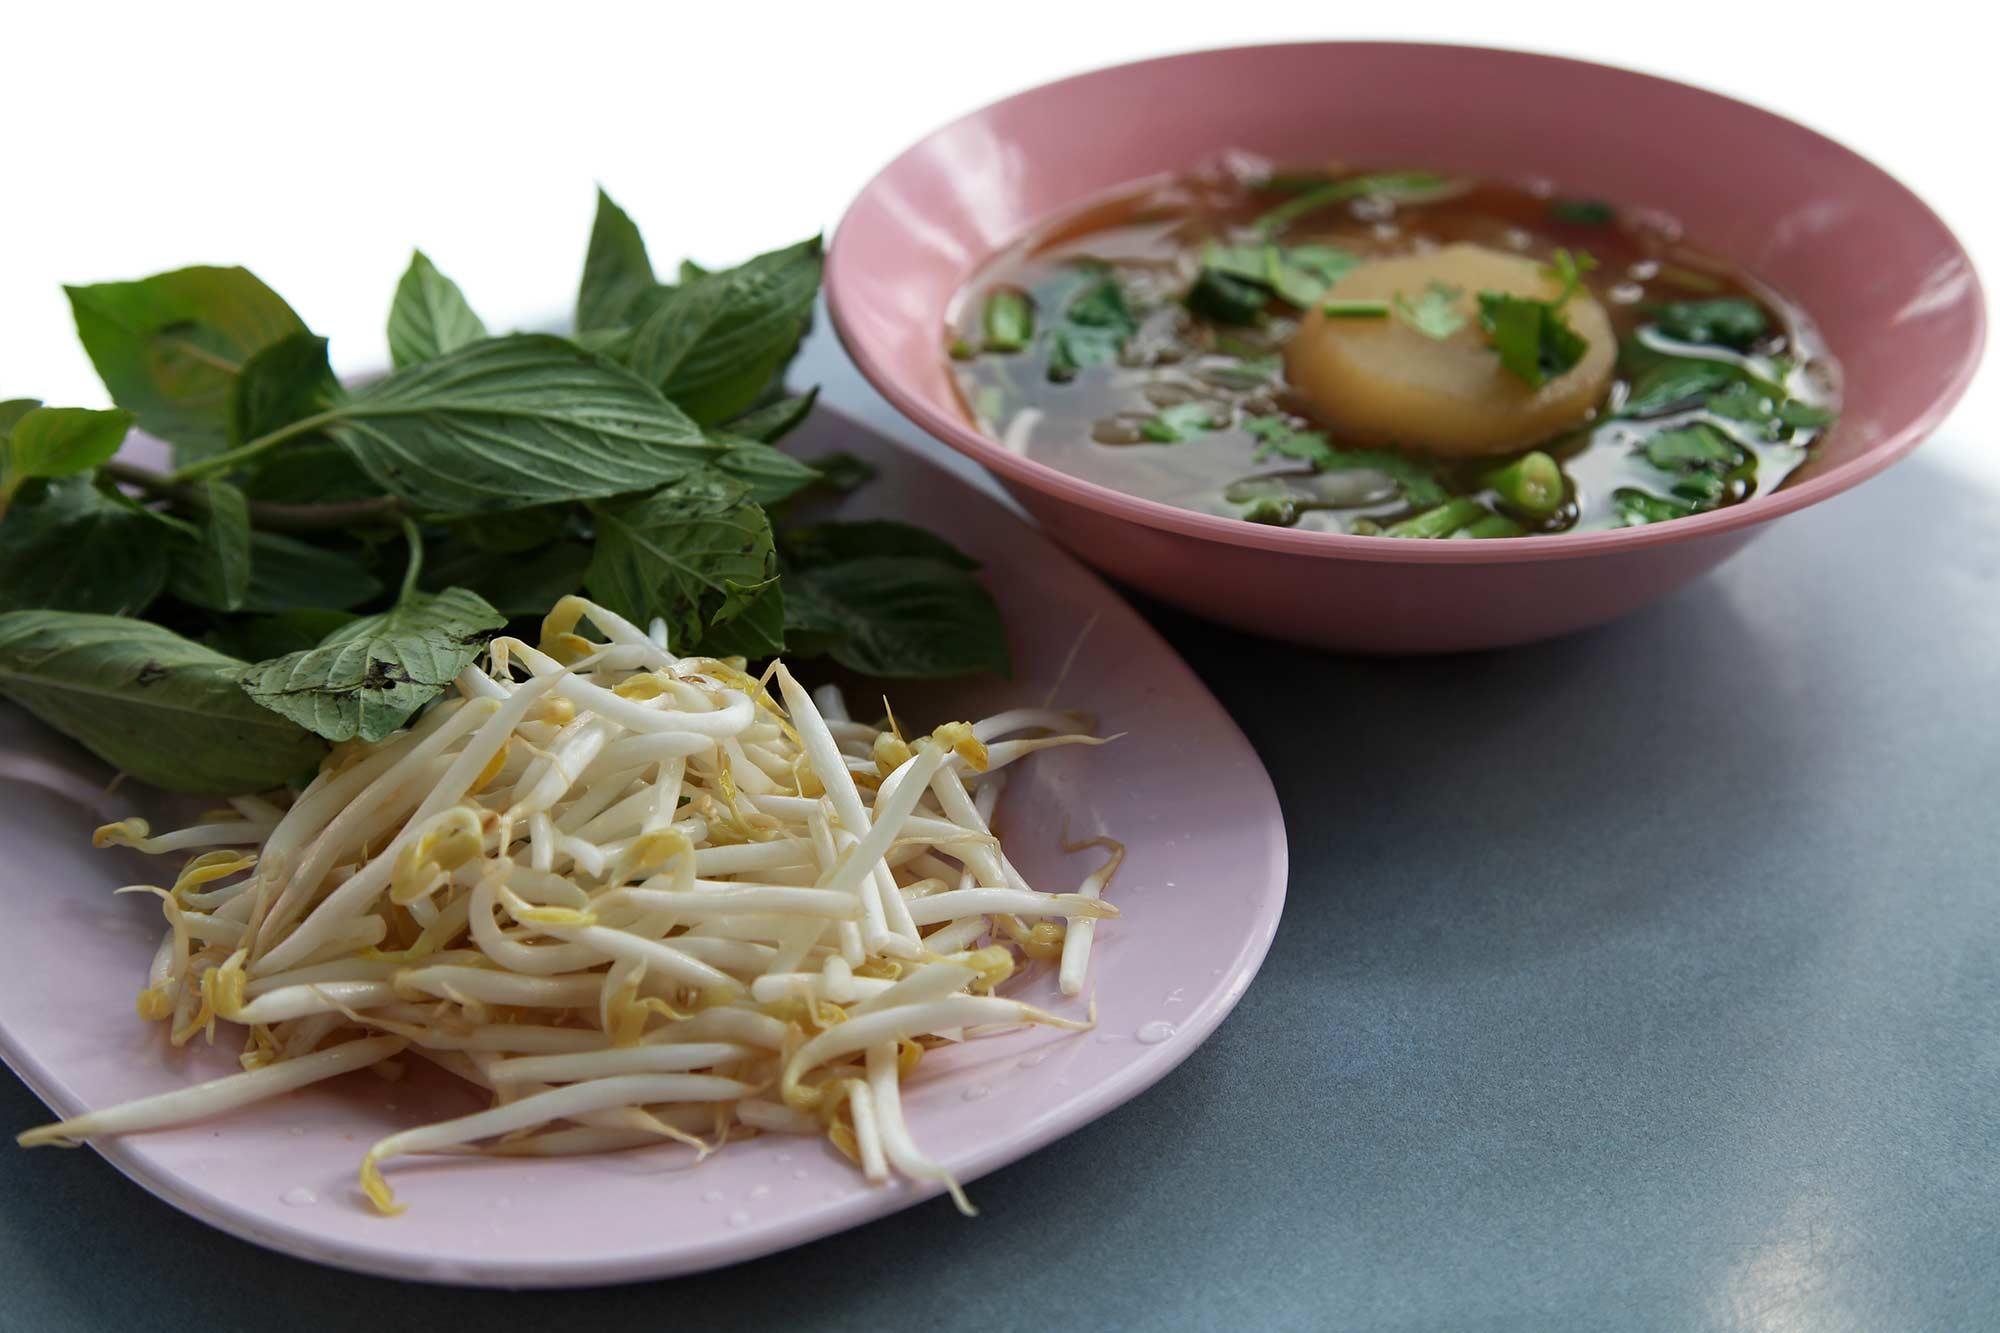 Thai soup in Bangkok, Thailand. © Ulli Maier & Nisa Maier